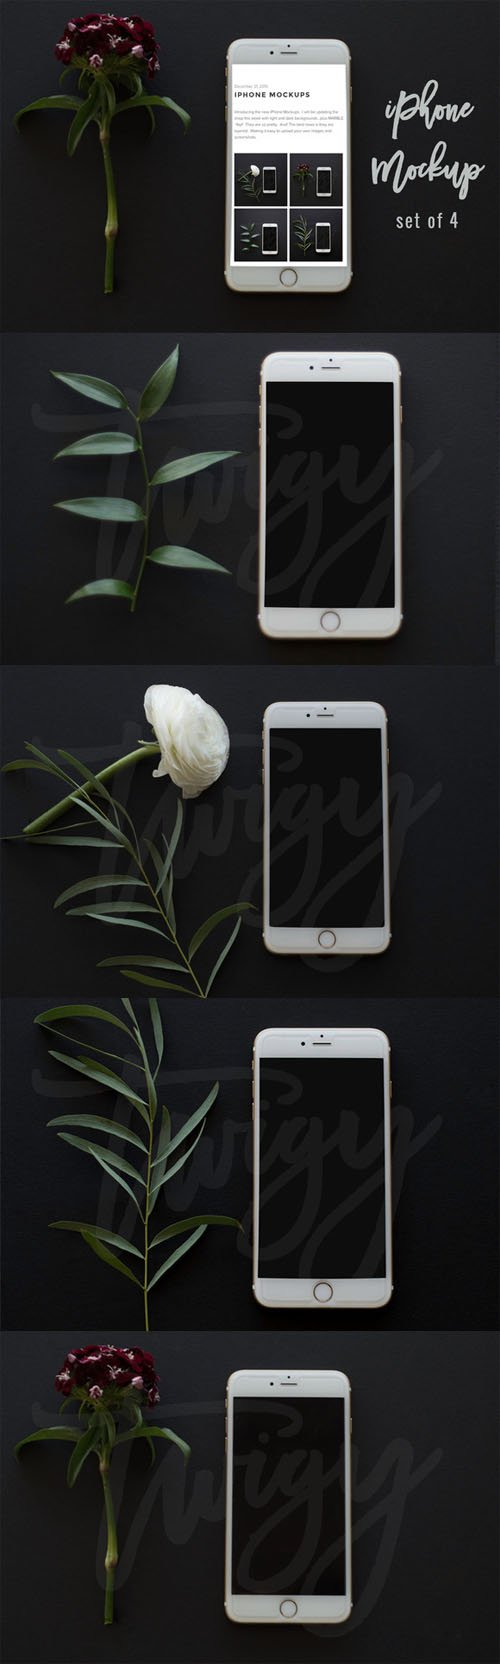 iPhone Mockup Square Format 477817